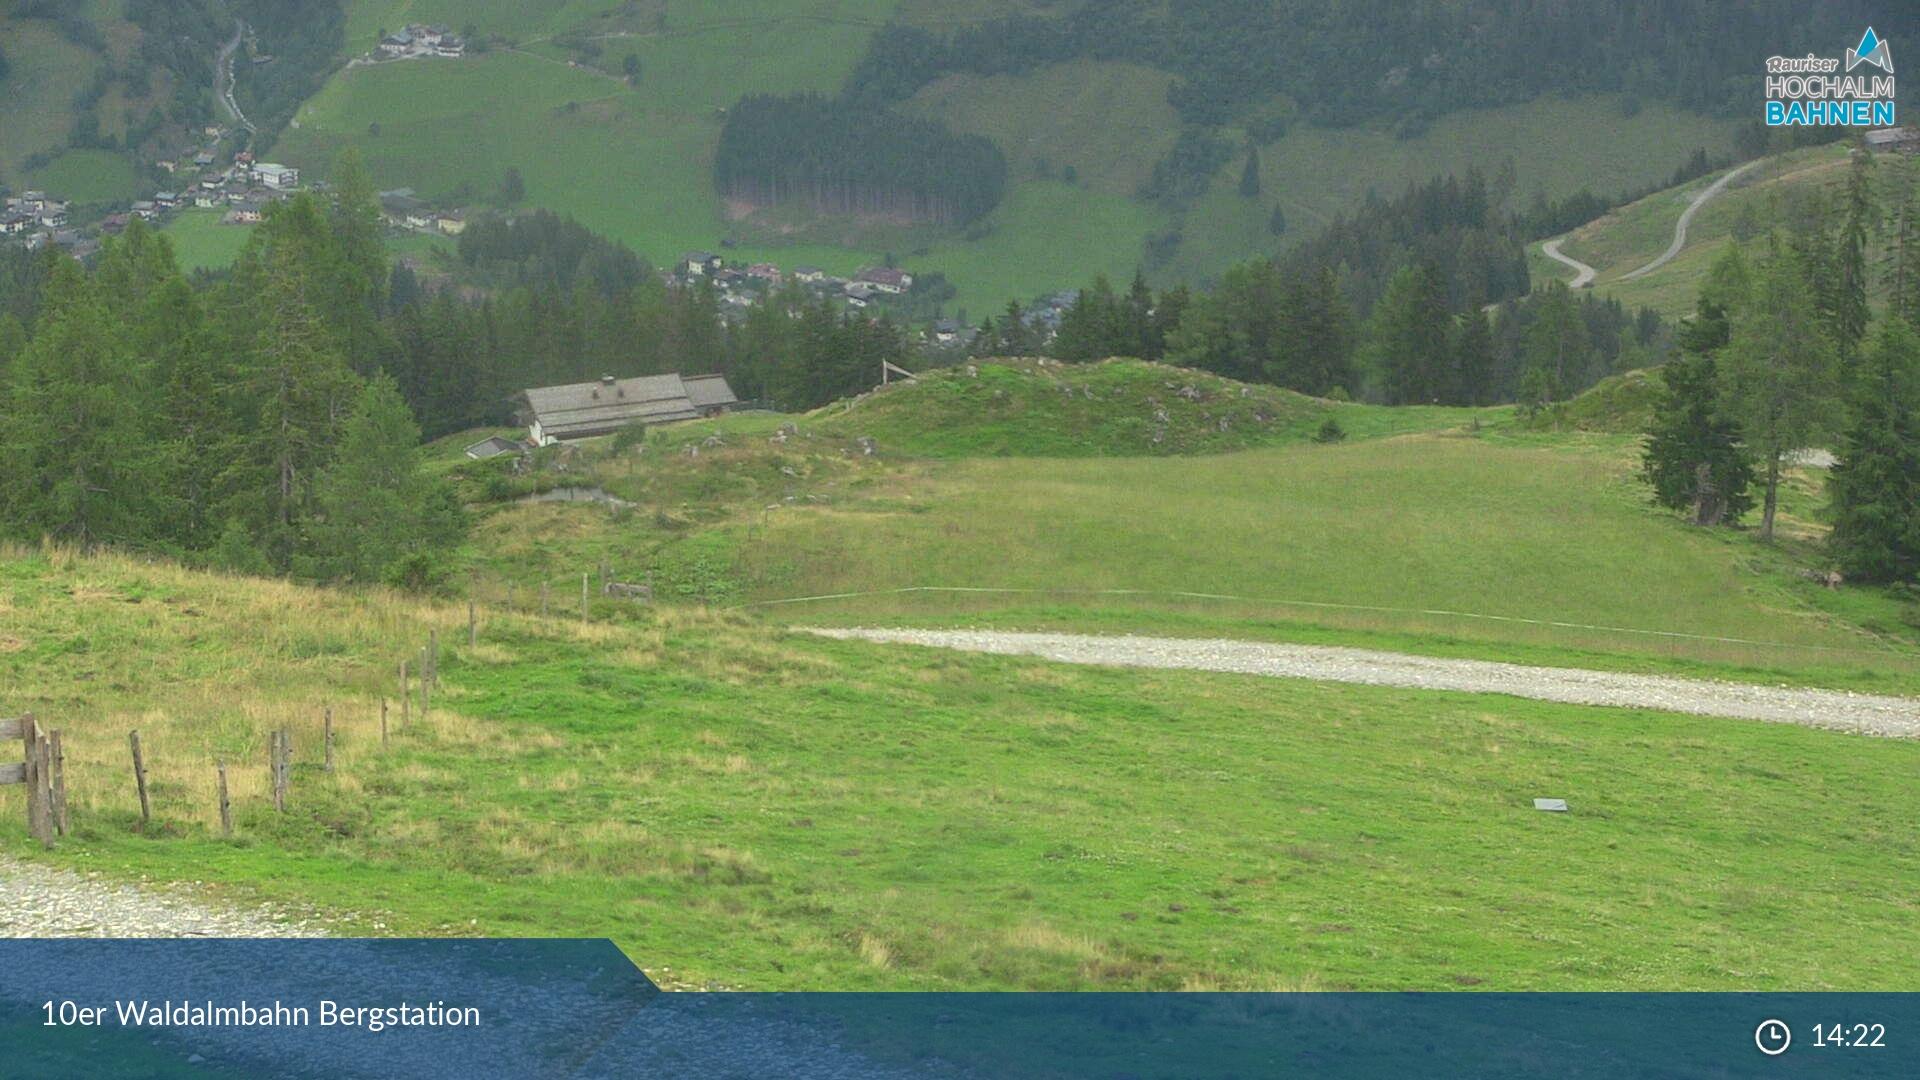 Rauris webcam - Rauriser ski station Waldalmbahn